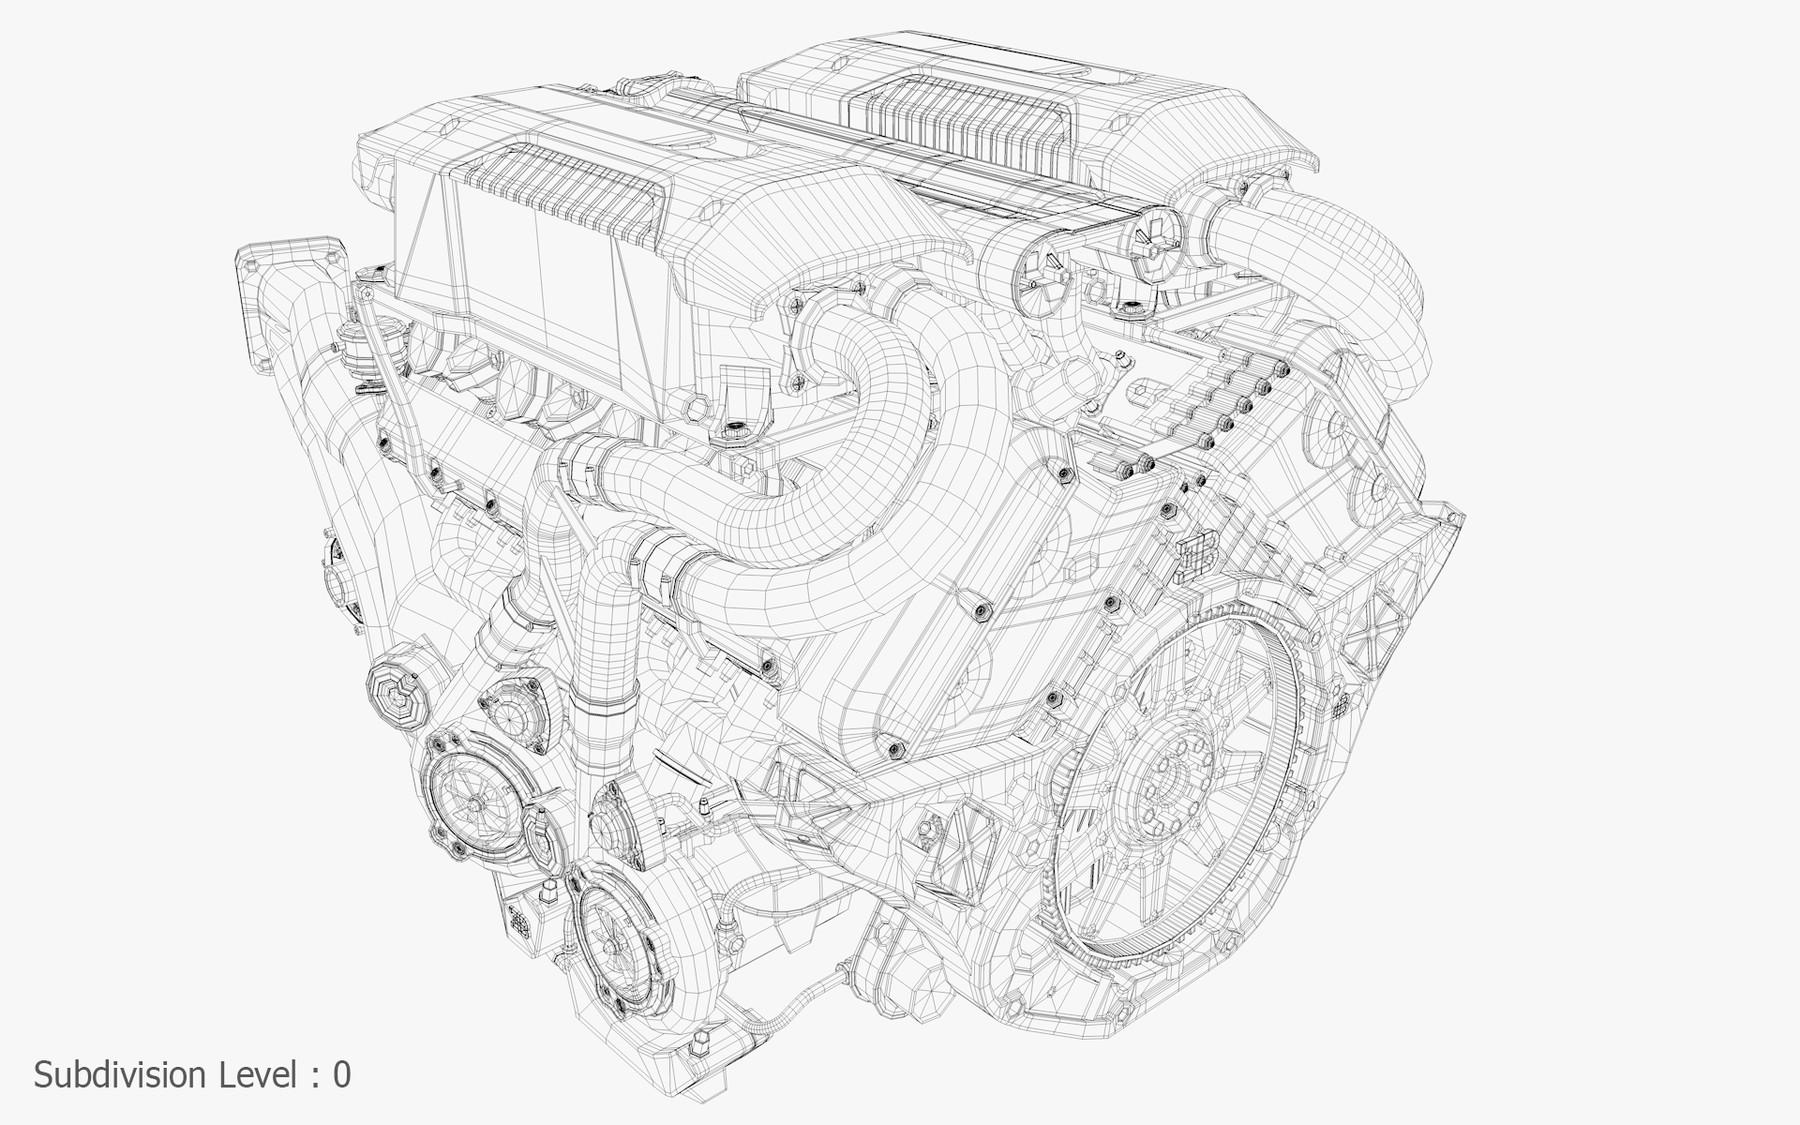 bugatti engine diagram wiring diagram database Audi Twin Turbo V8 artstation johann delestree bugatti engine schematics bugatti engine diagram